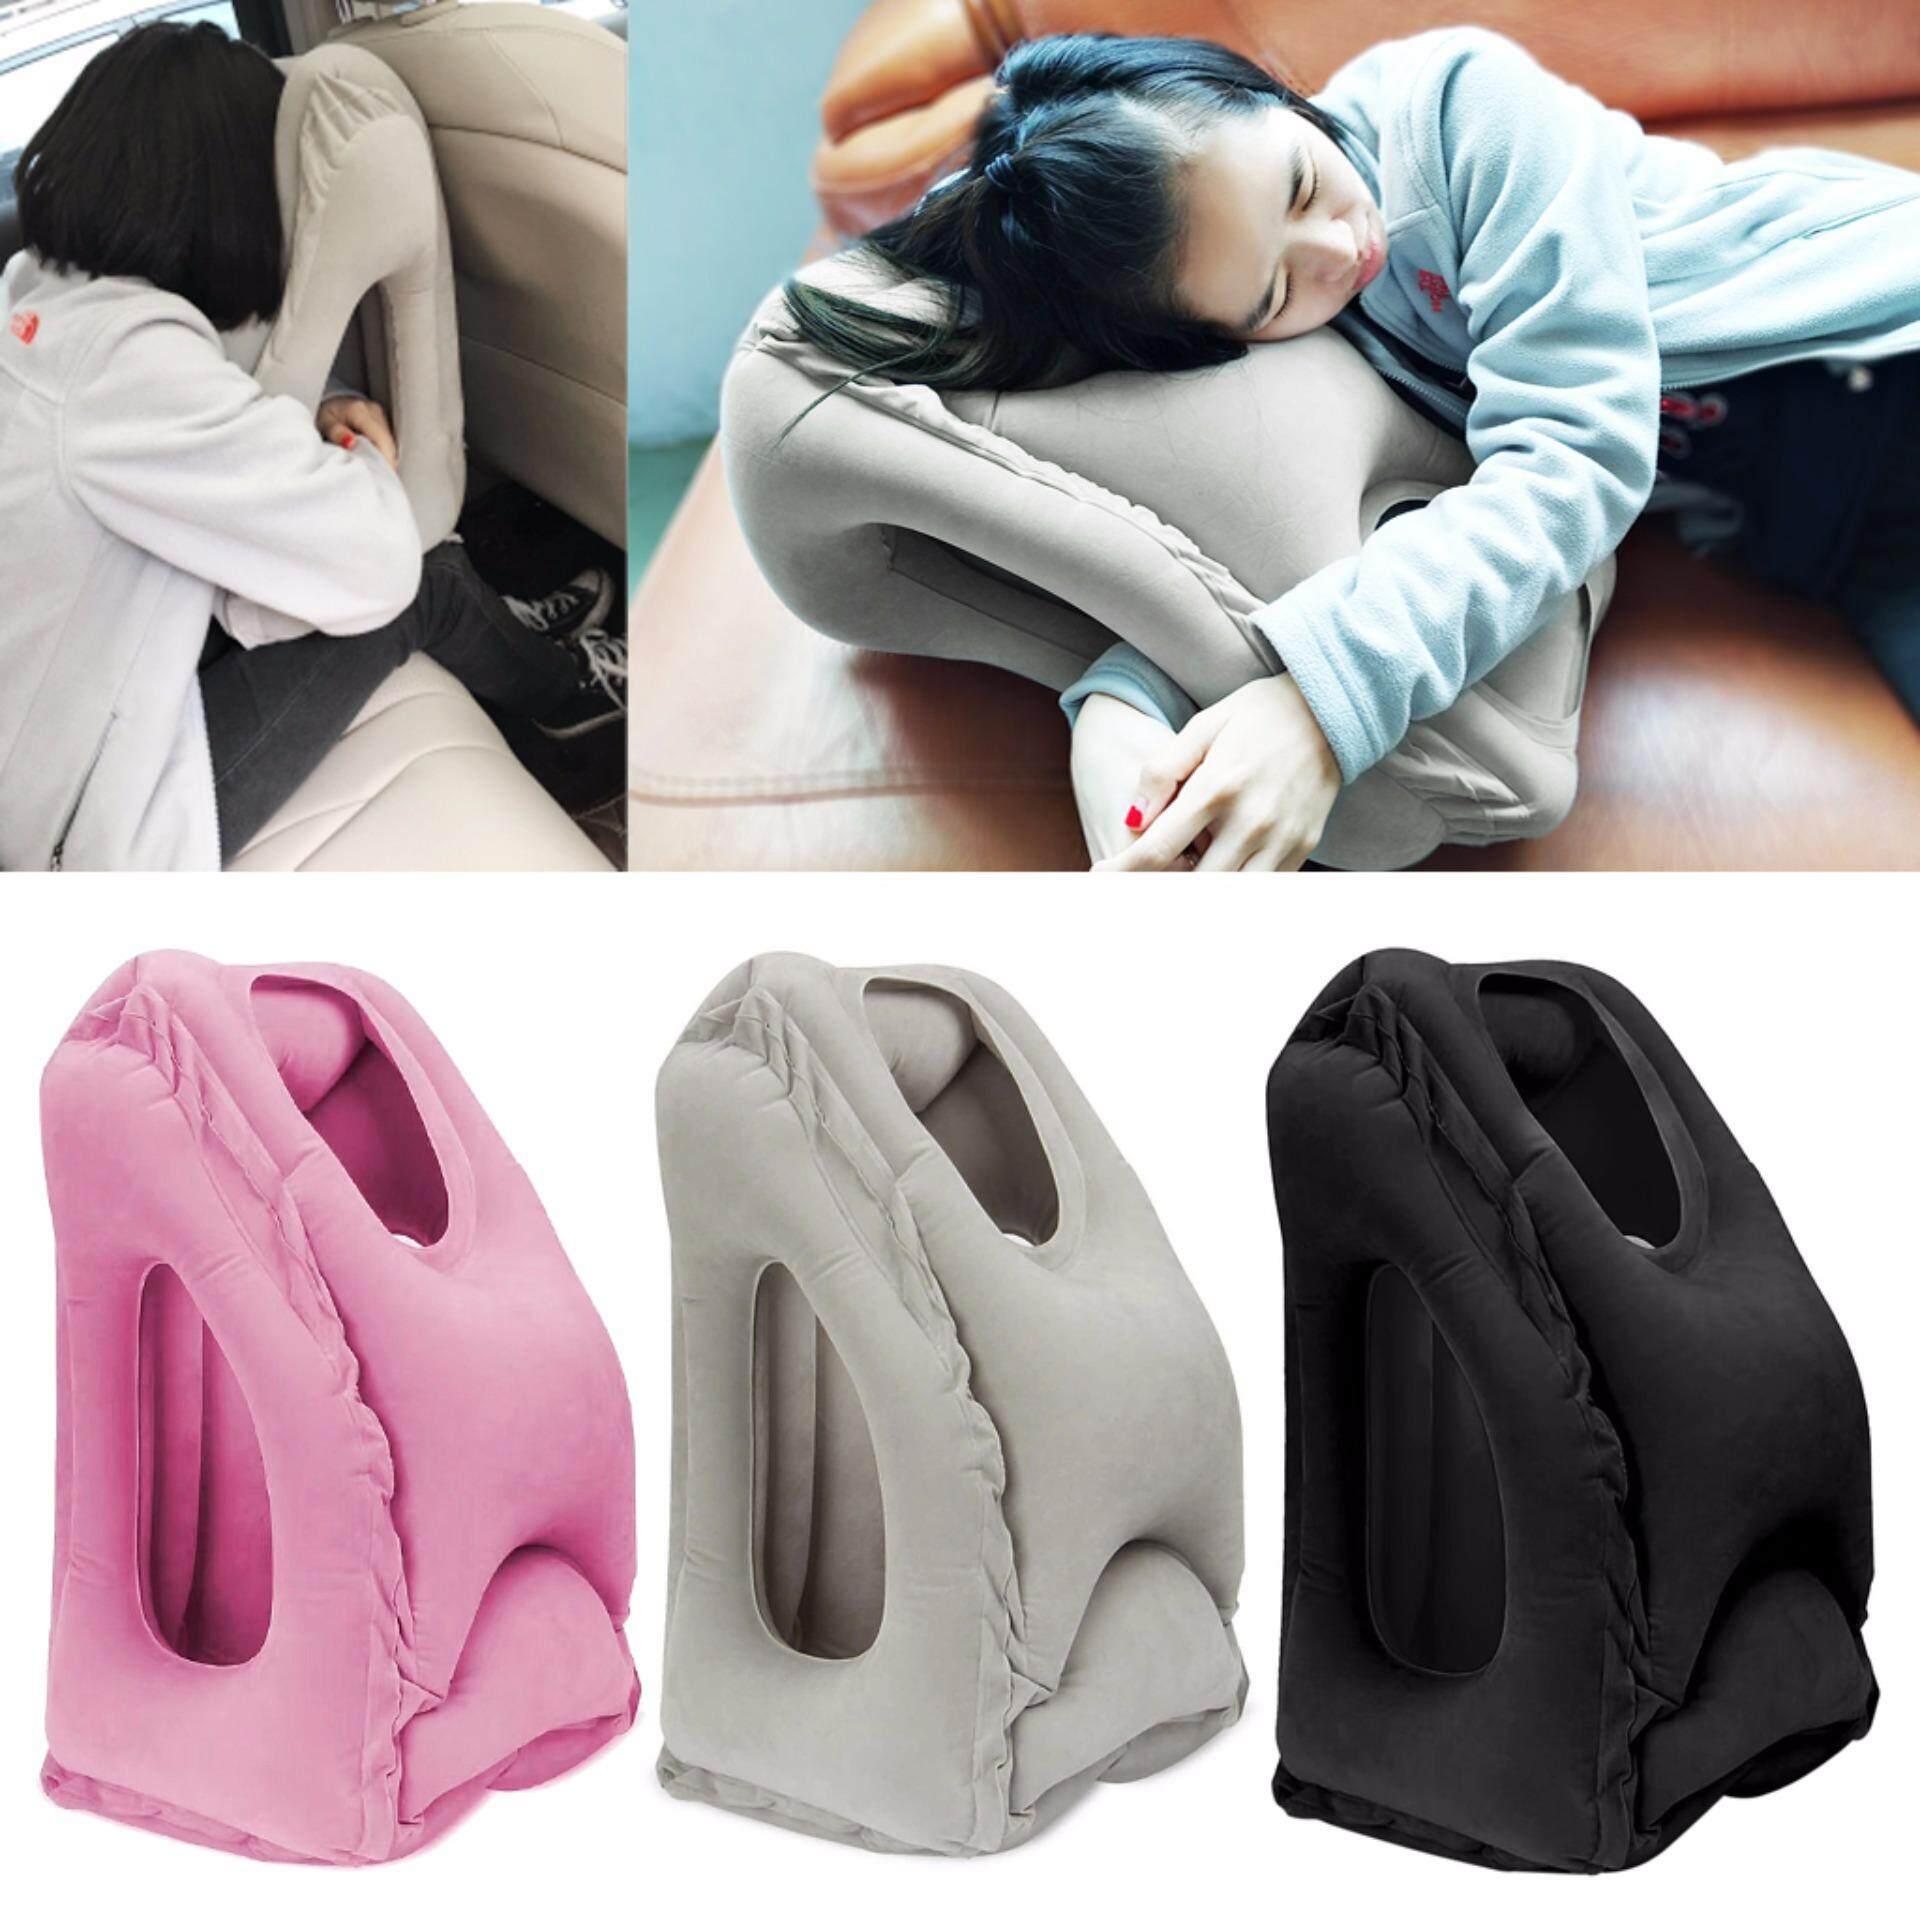 Bantal Leher Angin Set Travel Pillow Inflatable Daftar Harga Bestway Kepala Dapat Diisi Udara Tidur Perjalanan Chin Kantor Nap Internasional